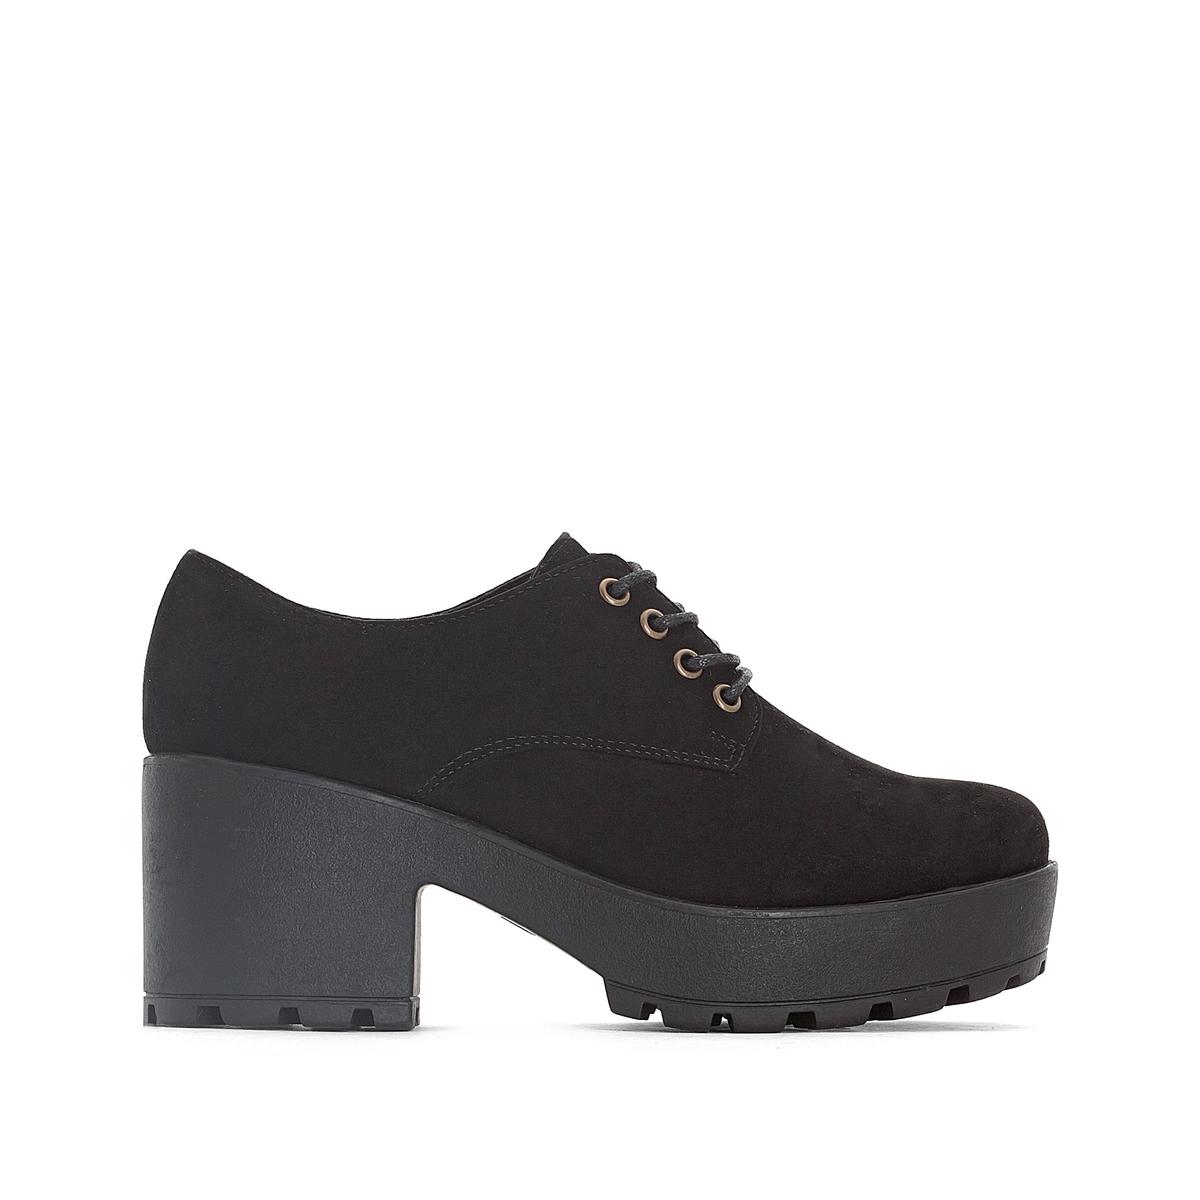 Ботинки-дерби на каблуке Cruise цены онлайн